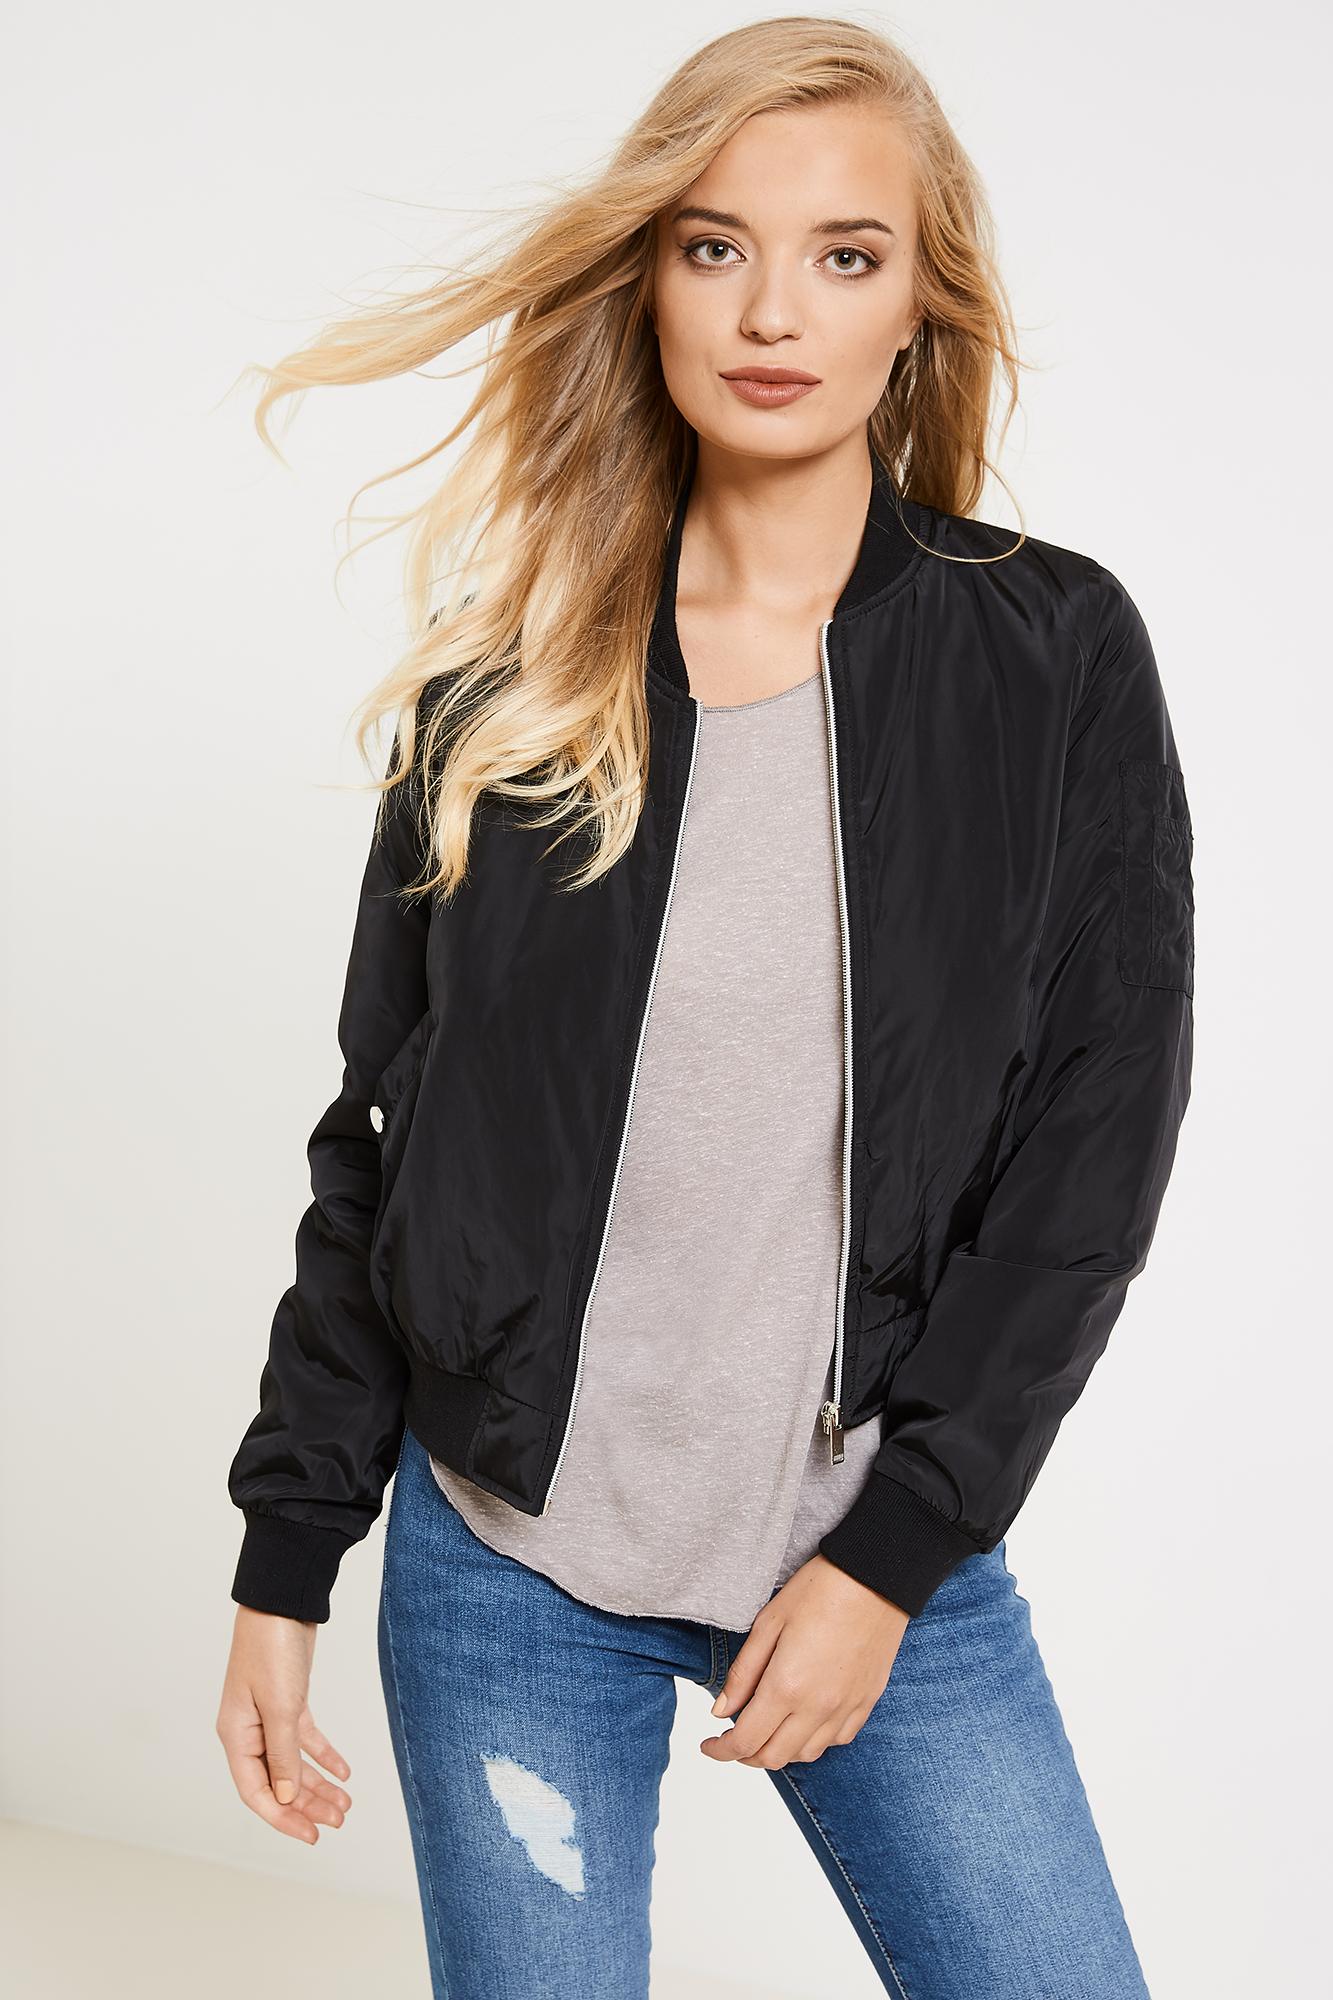 Vero Moda Elin Short Bomber Jacket | eBay